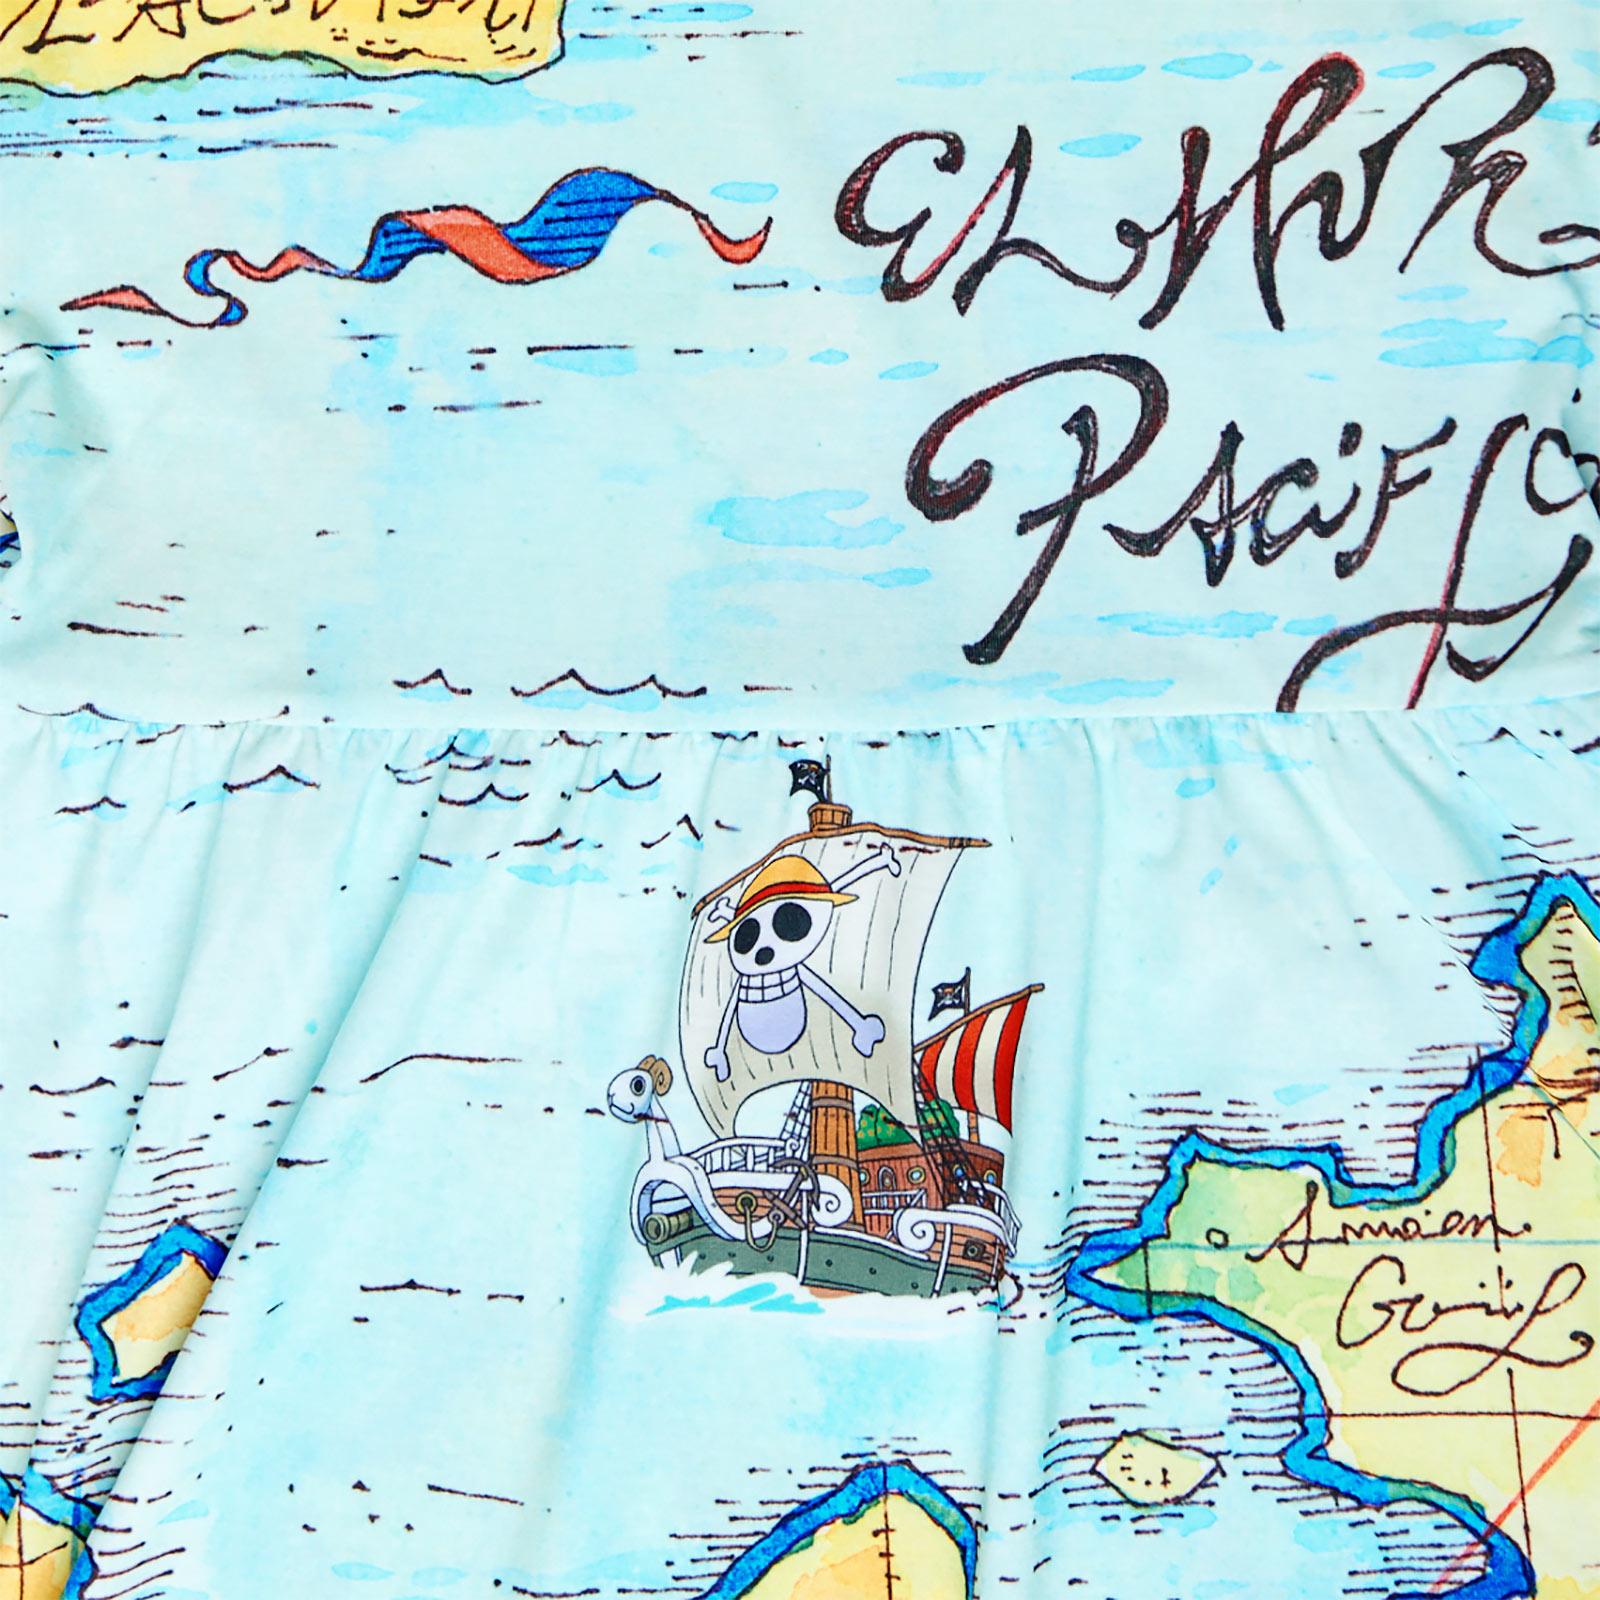 One Piece - East Blue Map Minikleid